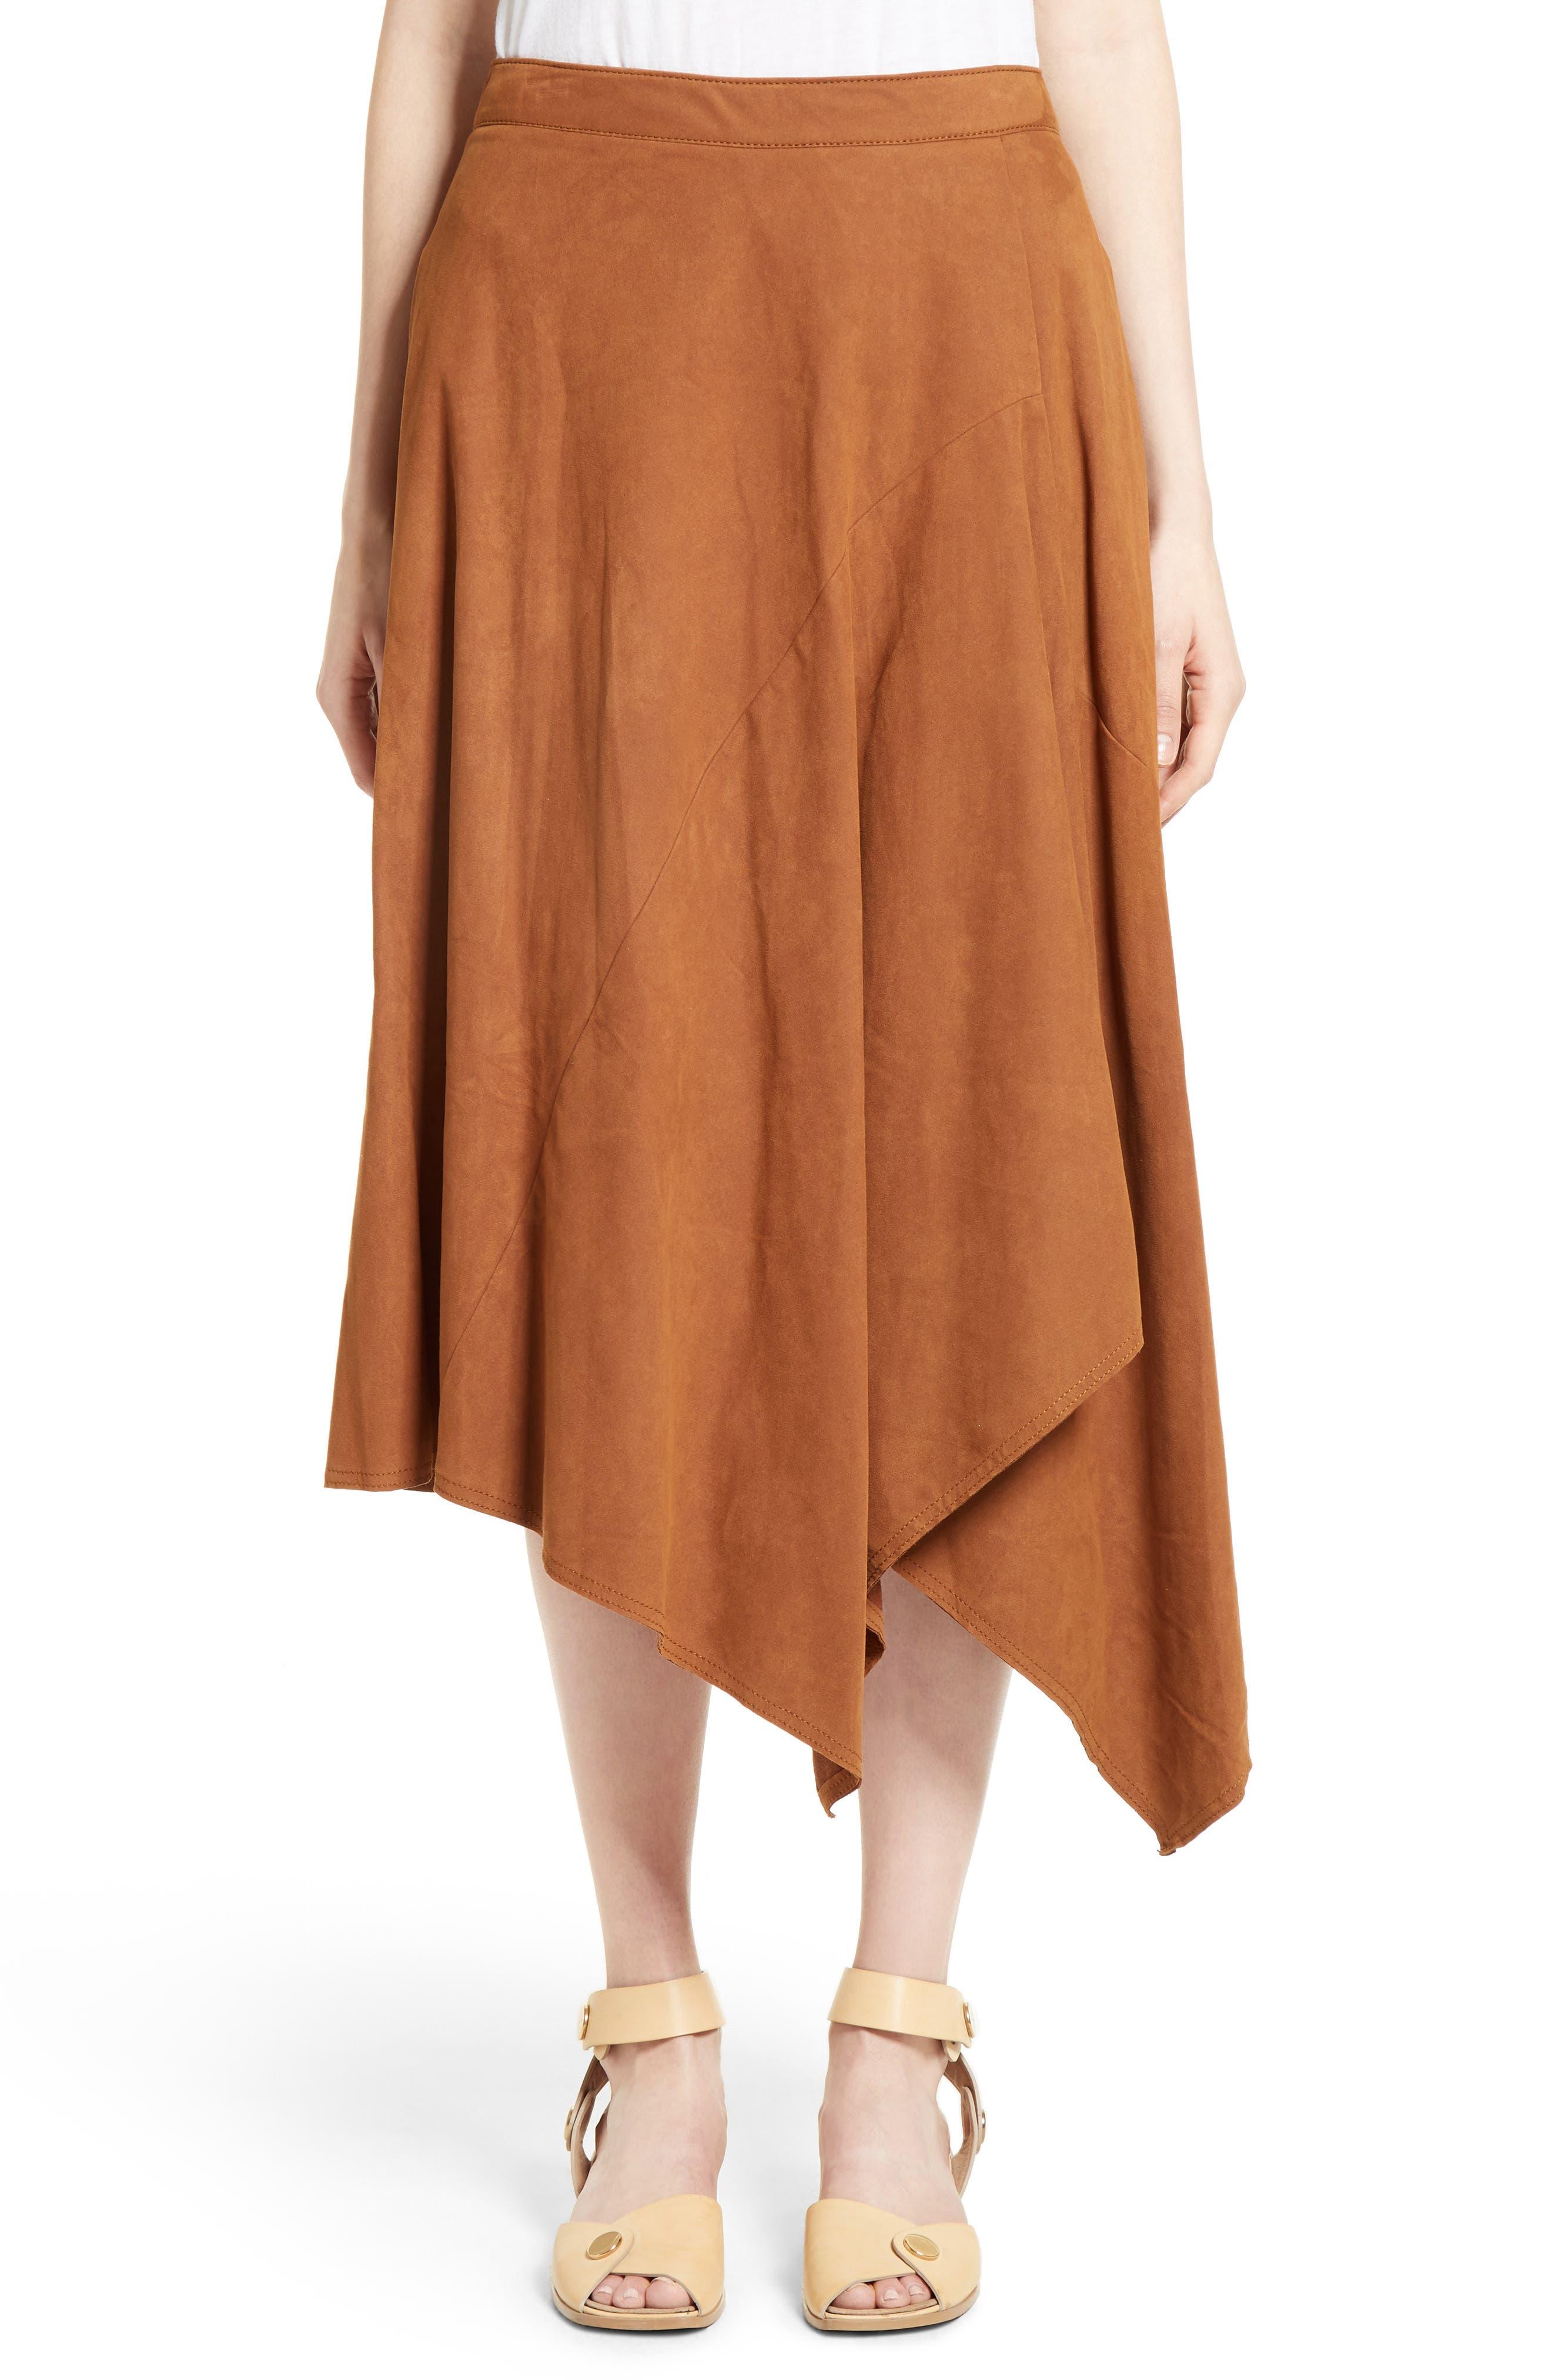 STELLA MCCARTNEY Faux Suede Asymmetrical Midi Skirt